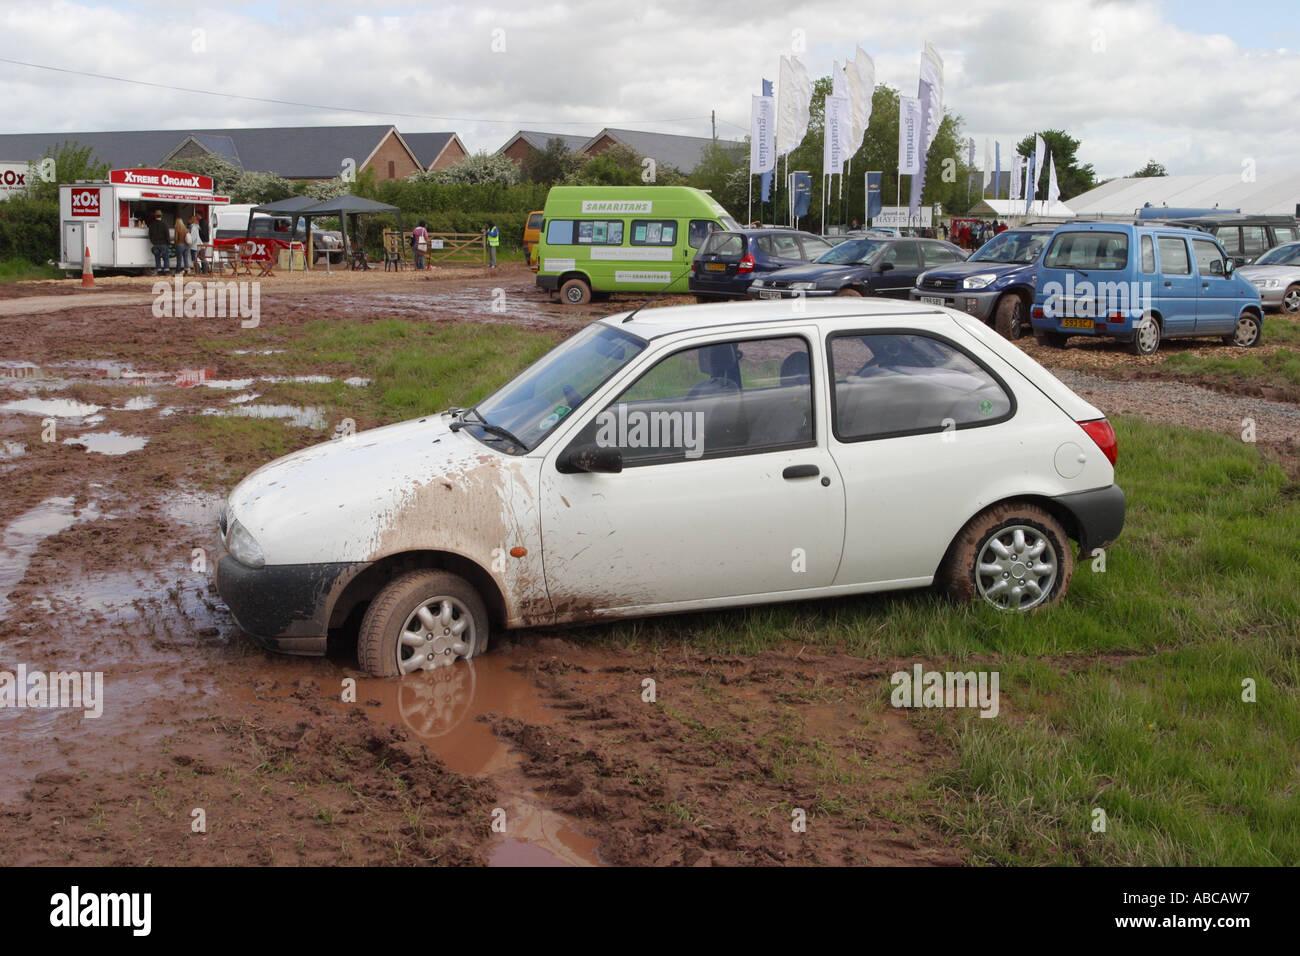 Car stuck in mud muddy car park at Hay Festival May 2006 Stock Photo